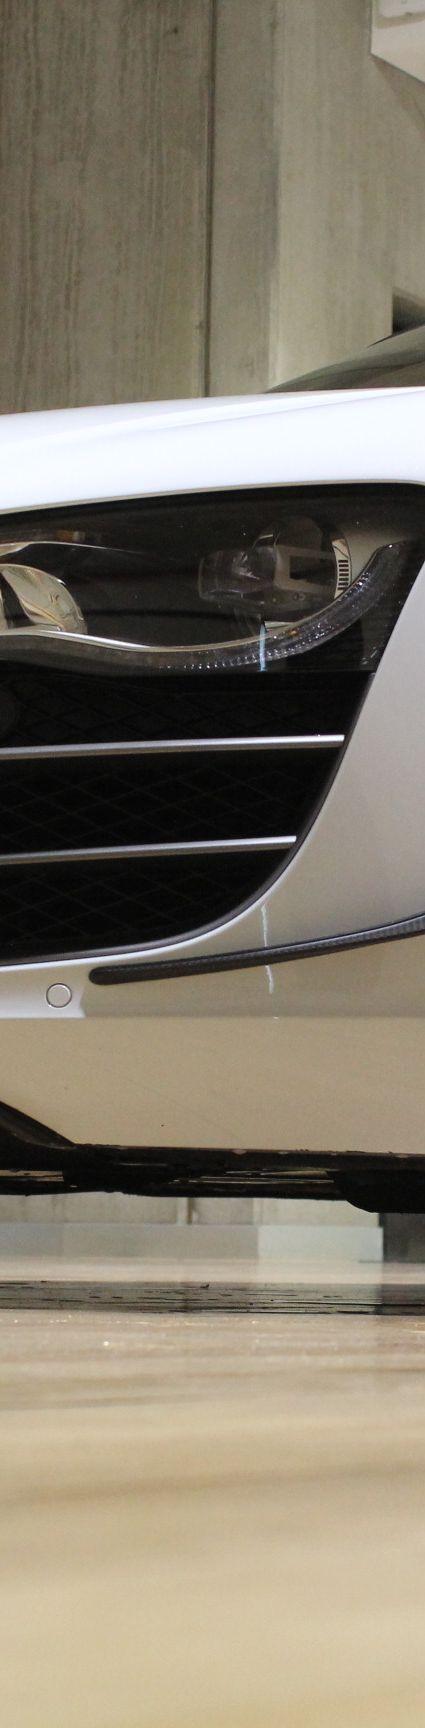 2012 Audi R8 GT Spyder 2dr SA SCT 6sp quattro 5.2i [MY12] - for sale in Australia